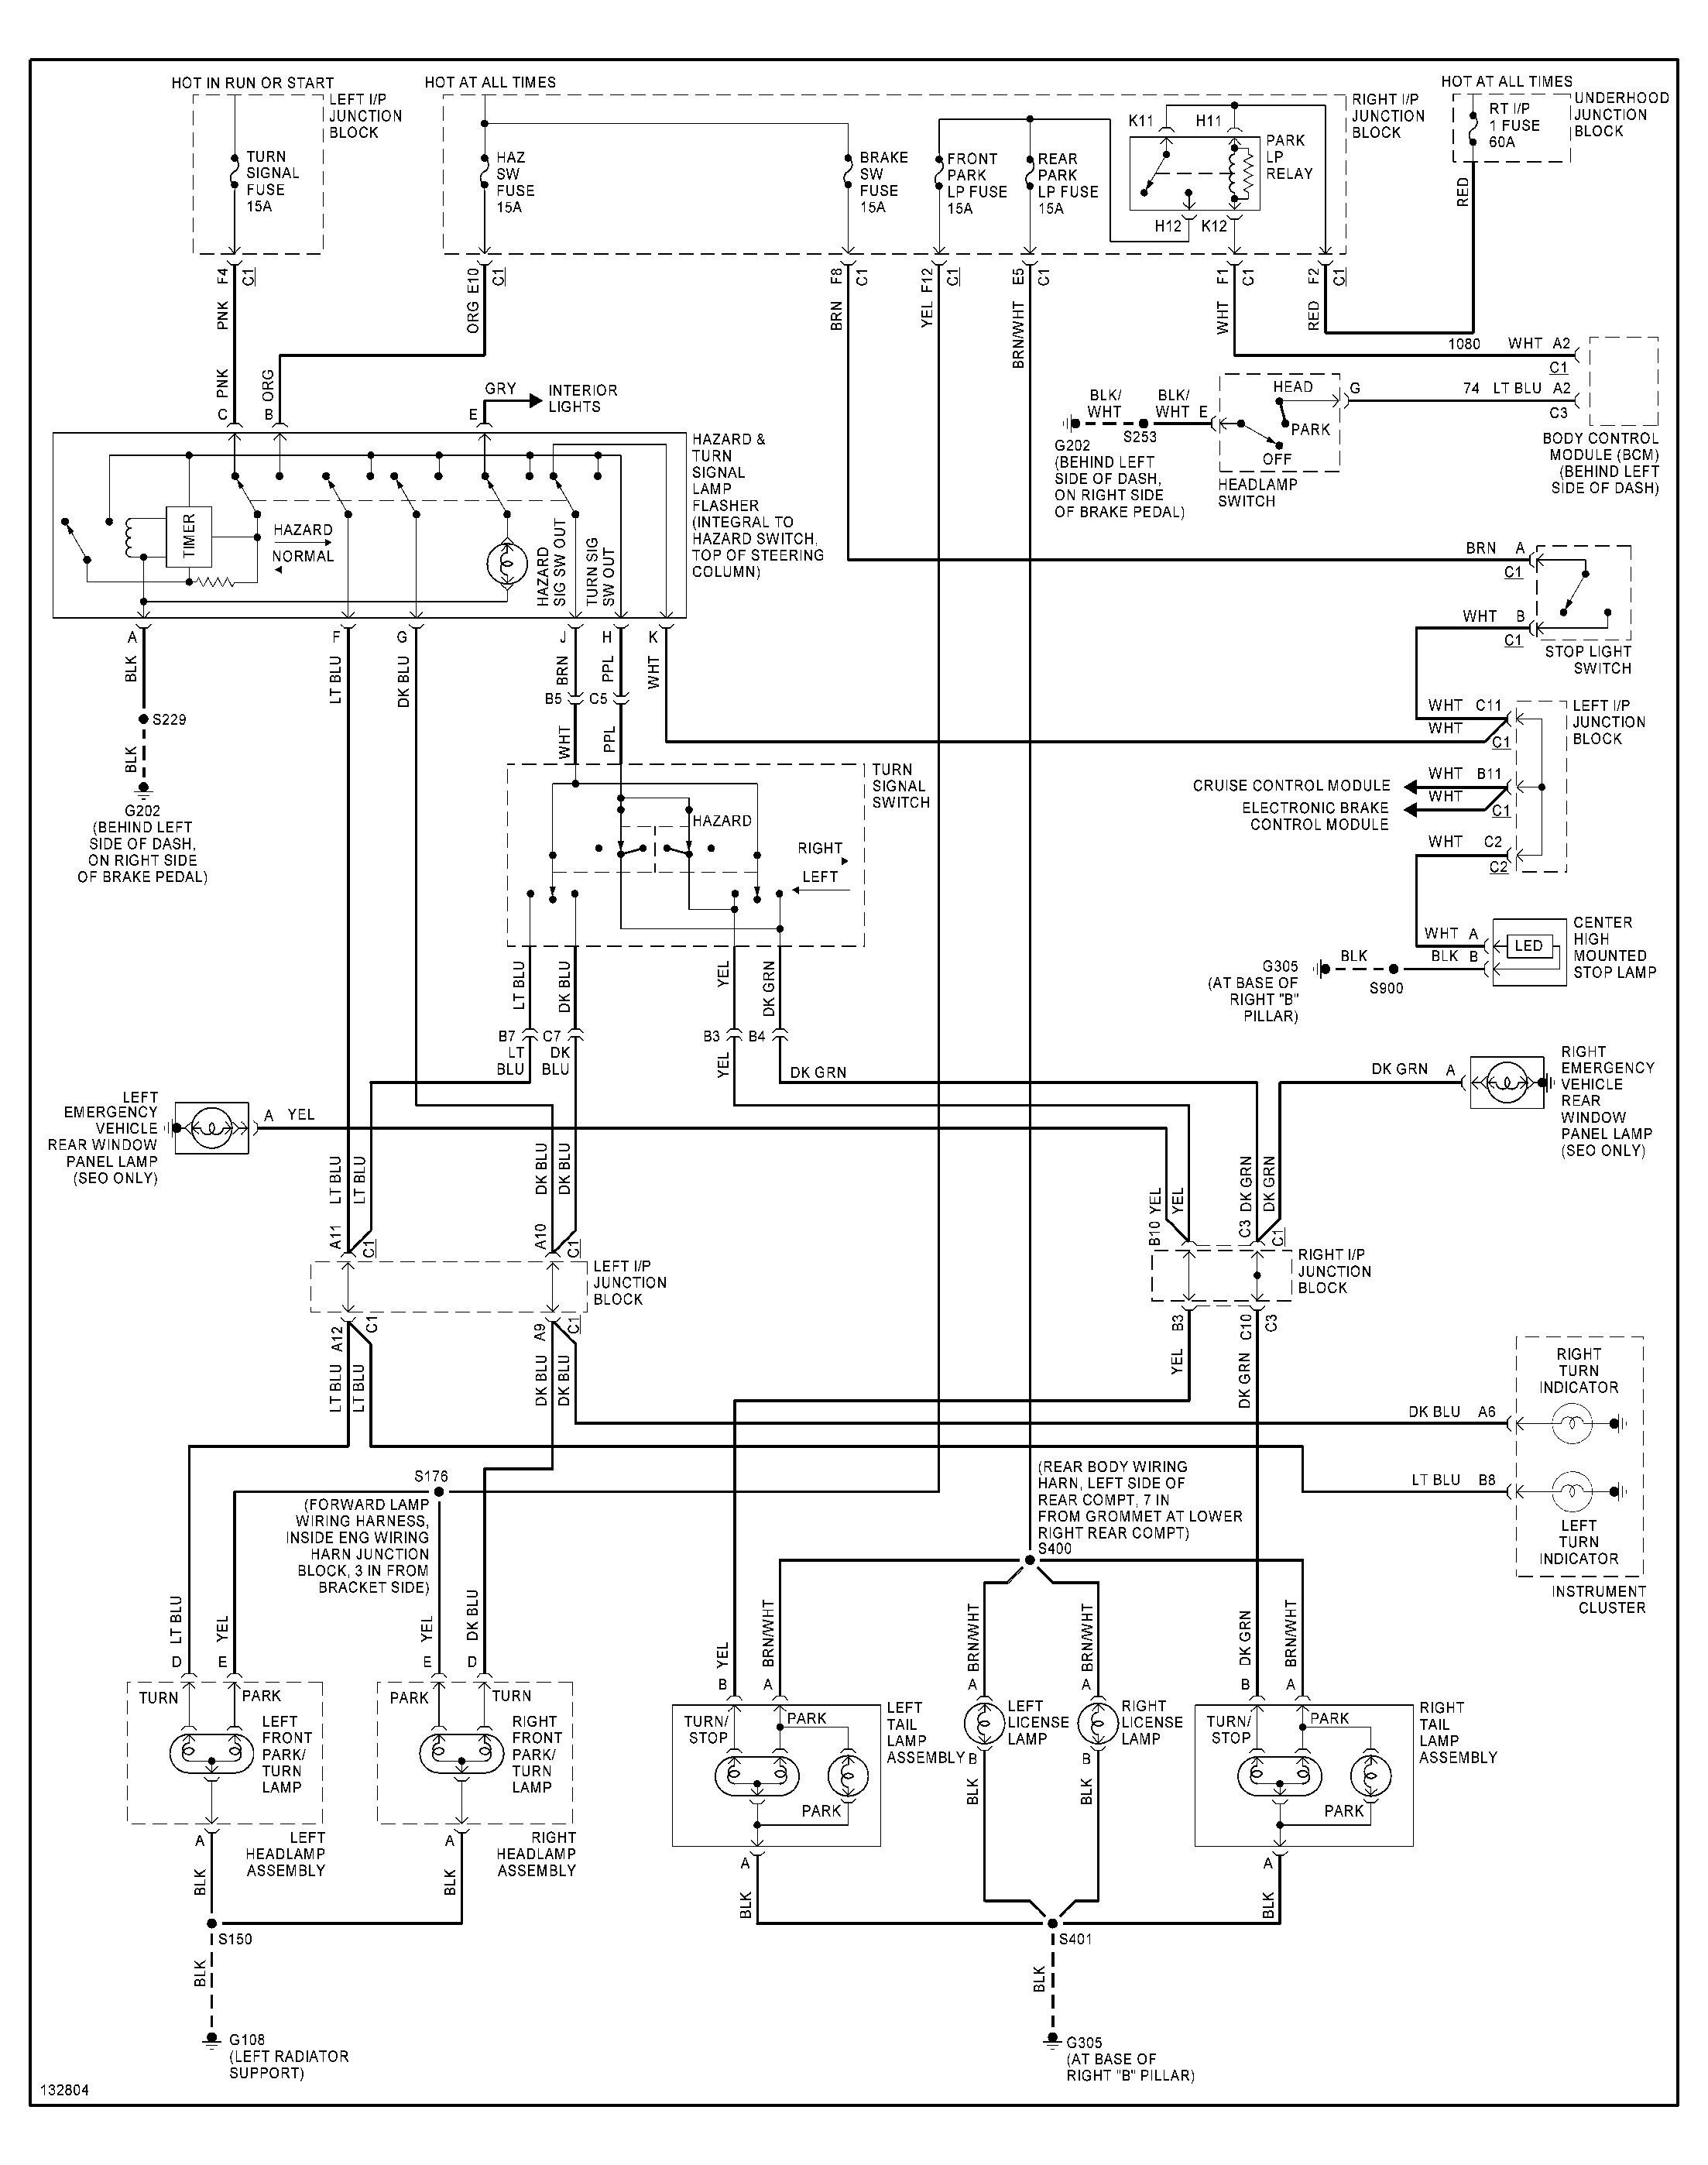 2003 Silverado 1500hd Brake Light Schematic Diagram] 1998 Chevy 1500 Brake Light Wiring Diagram Full Of 2003 Silverado 1500hd Brake Light Schematic